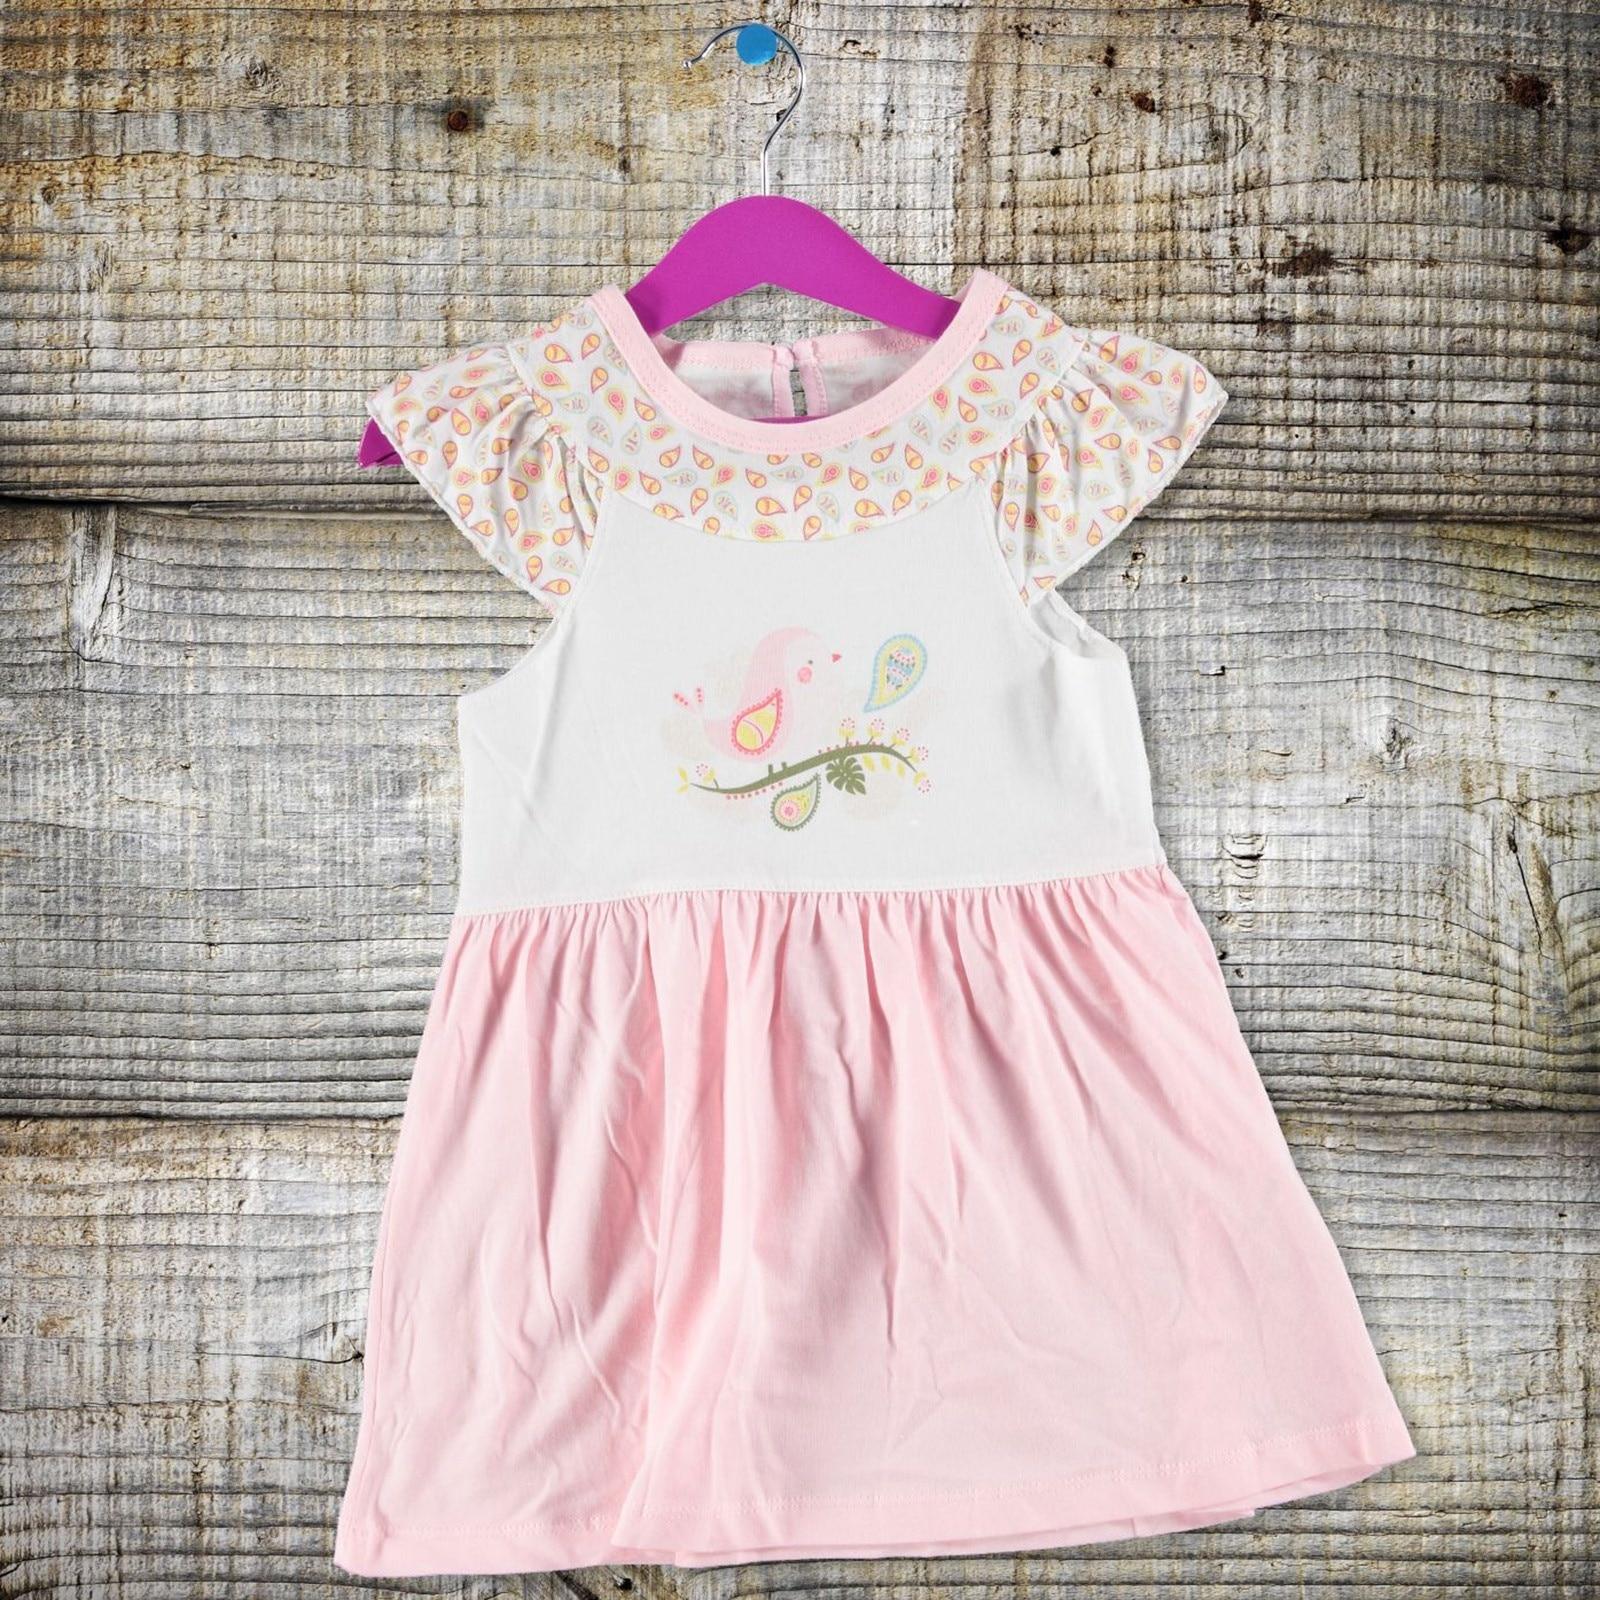 Ebebek Aziz Bebe Sparrow Baby Girl Dress